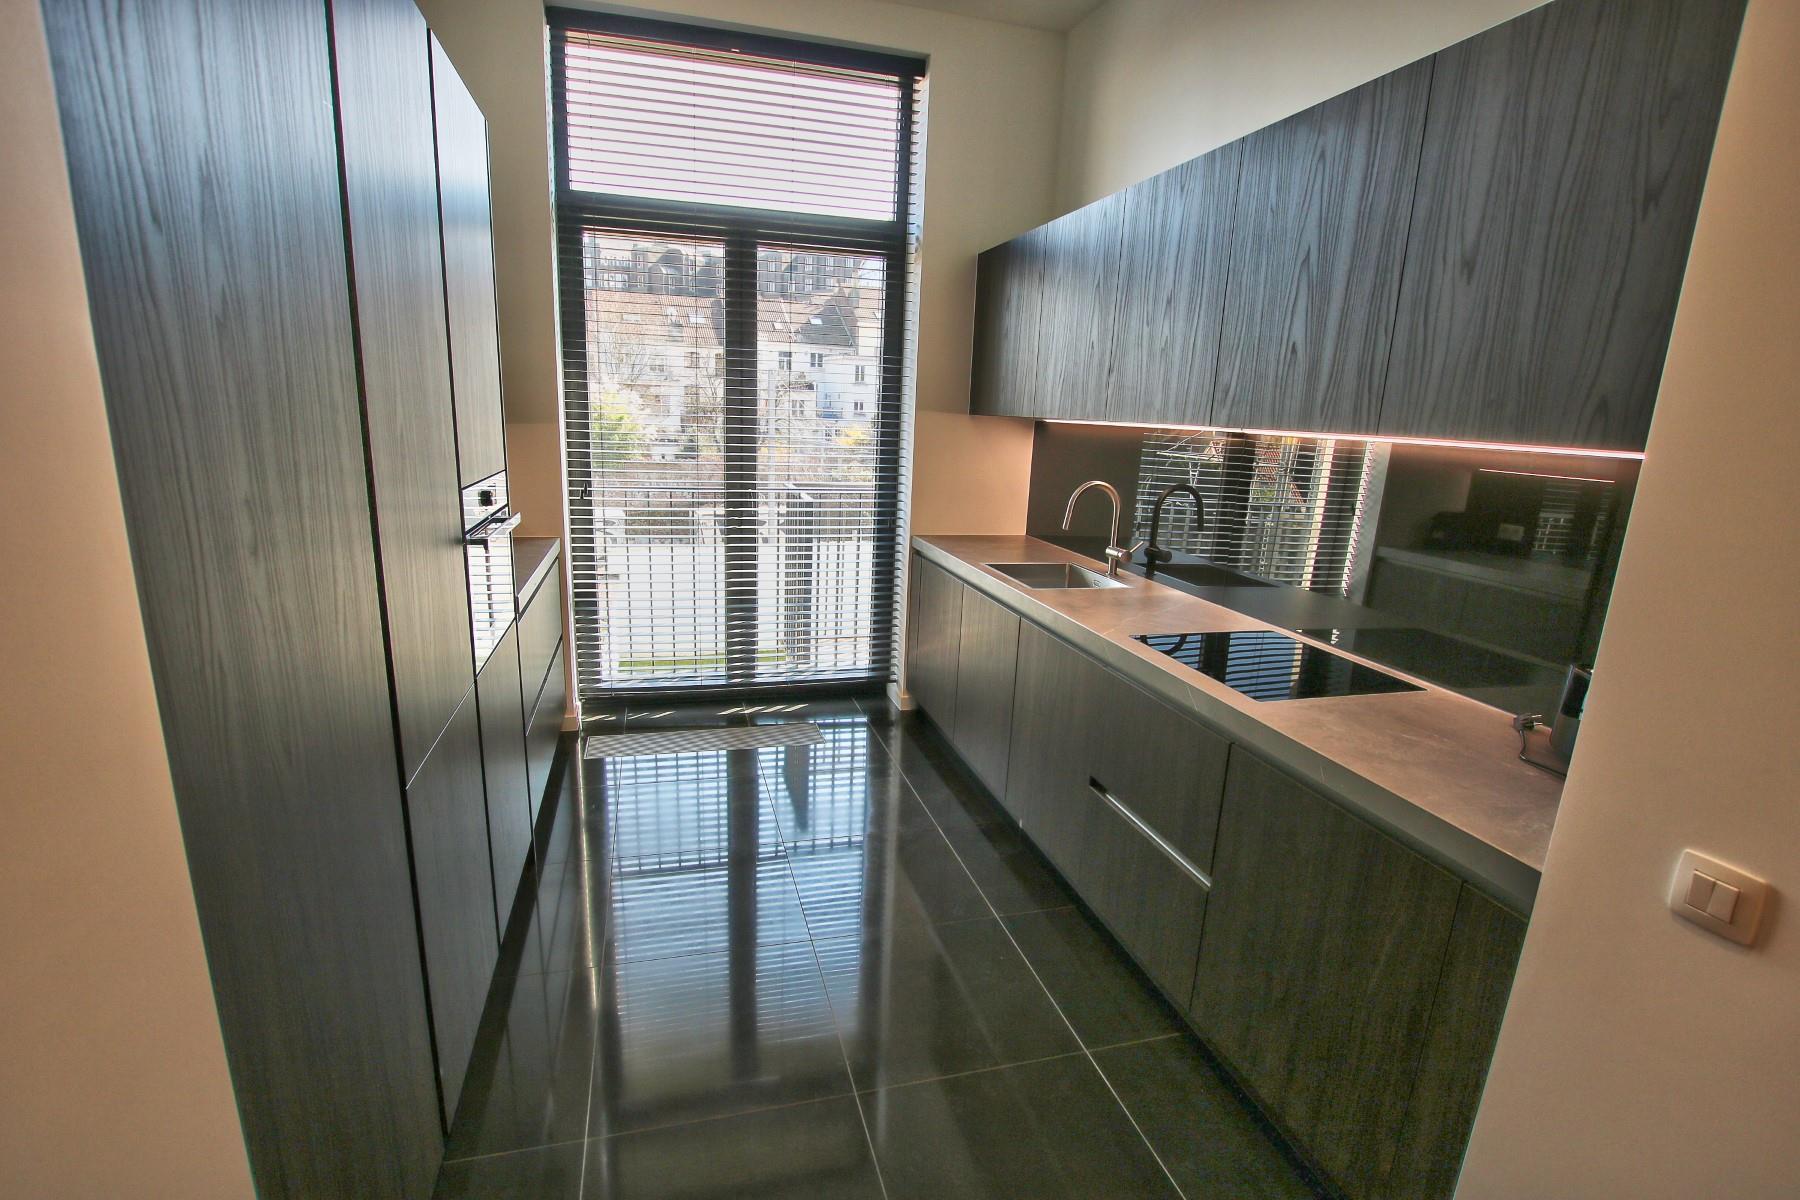 Appartement exceptionnel - Etterbeek - #4255737-3